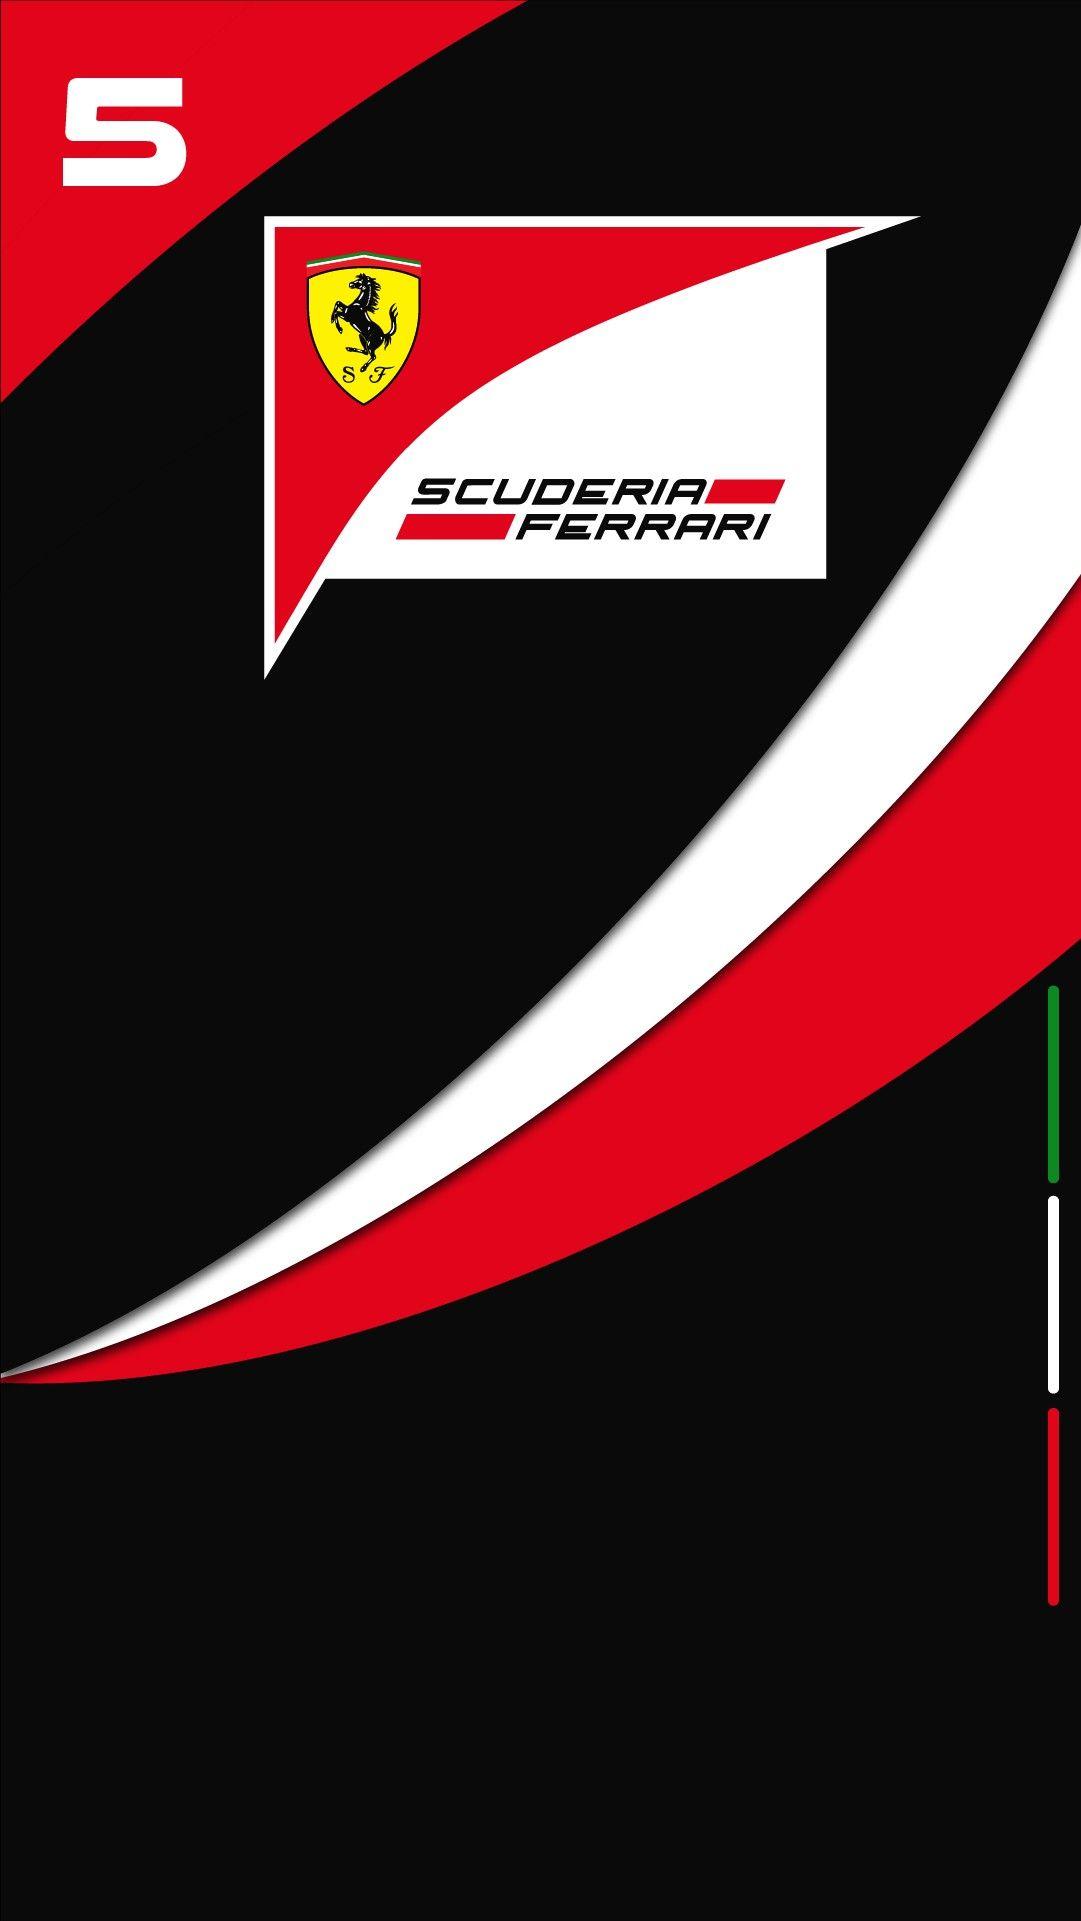 Scuderia Ferrari wallpaper  ferrari  f1  formula1  scuderiaferrari   sebastianvettel  sv5  kimiraikkonen  kr7  grandprix  motorsport  vettel   racing b5799a07d22